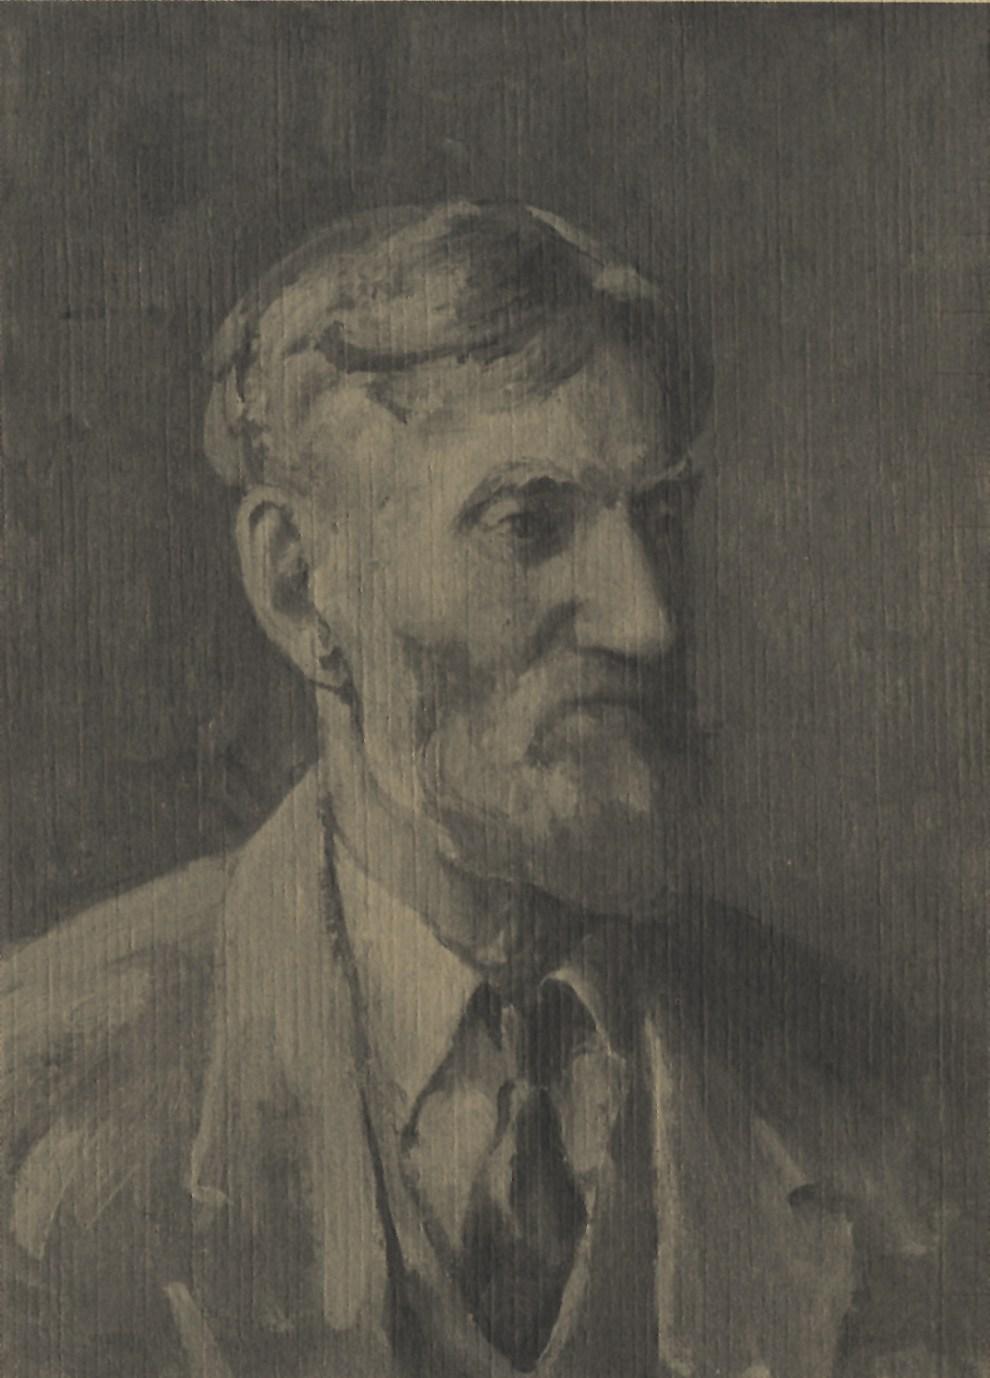 Emil Carlsen Self-Portrait, c.1920